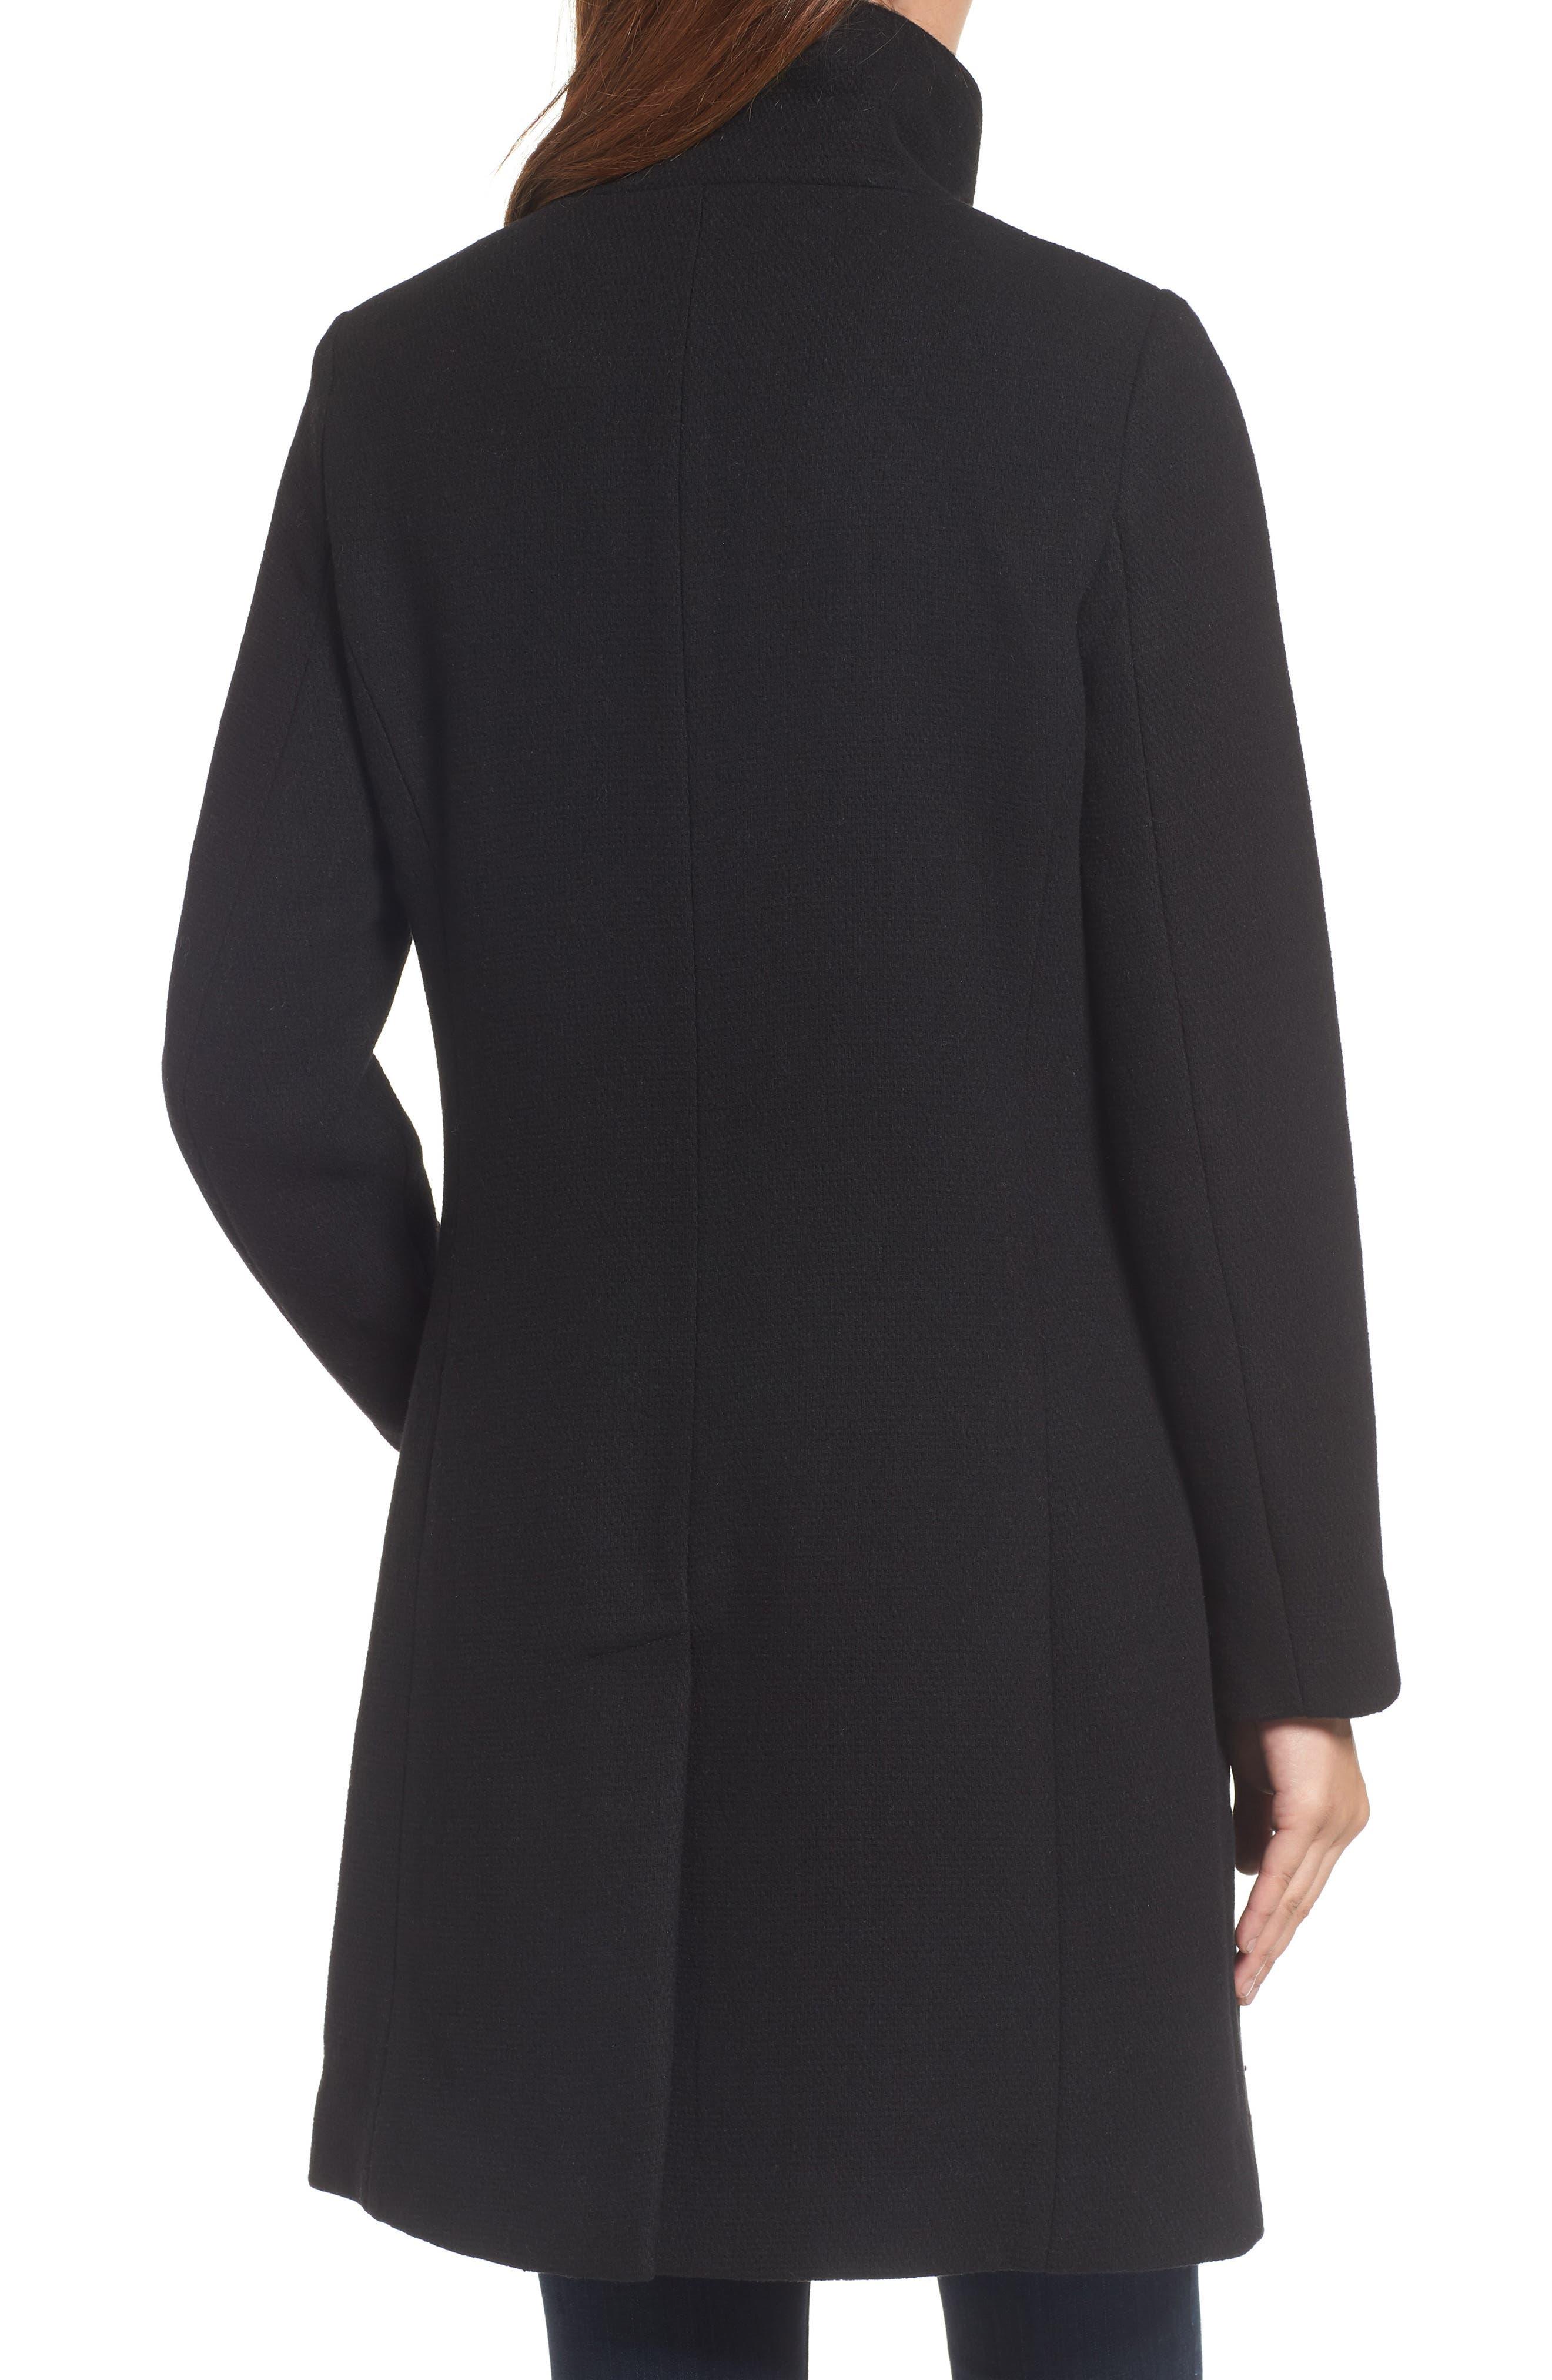 ELLEN TRACY,                             A-Line Coat,                             Alternate thumbnail 2, color,                             001